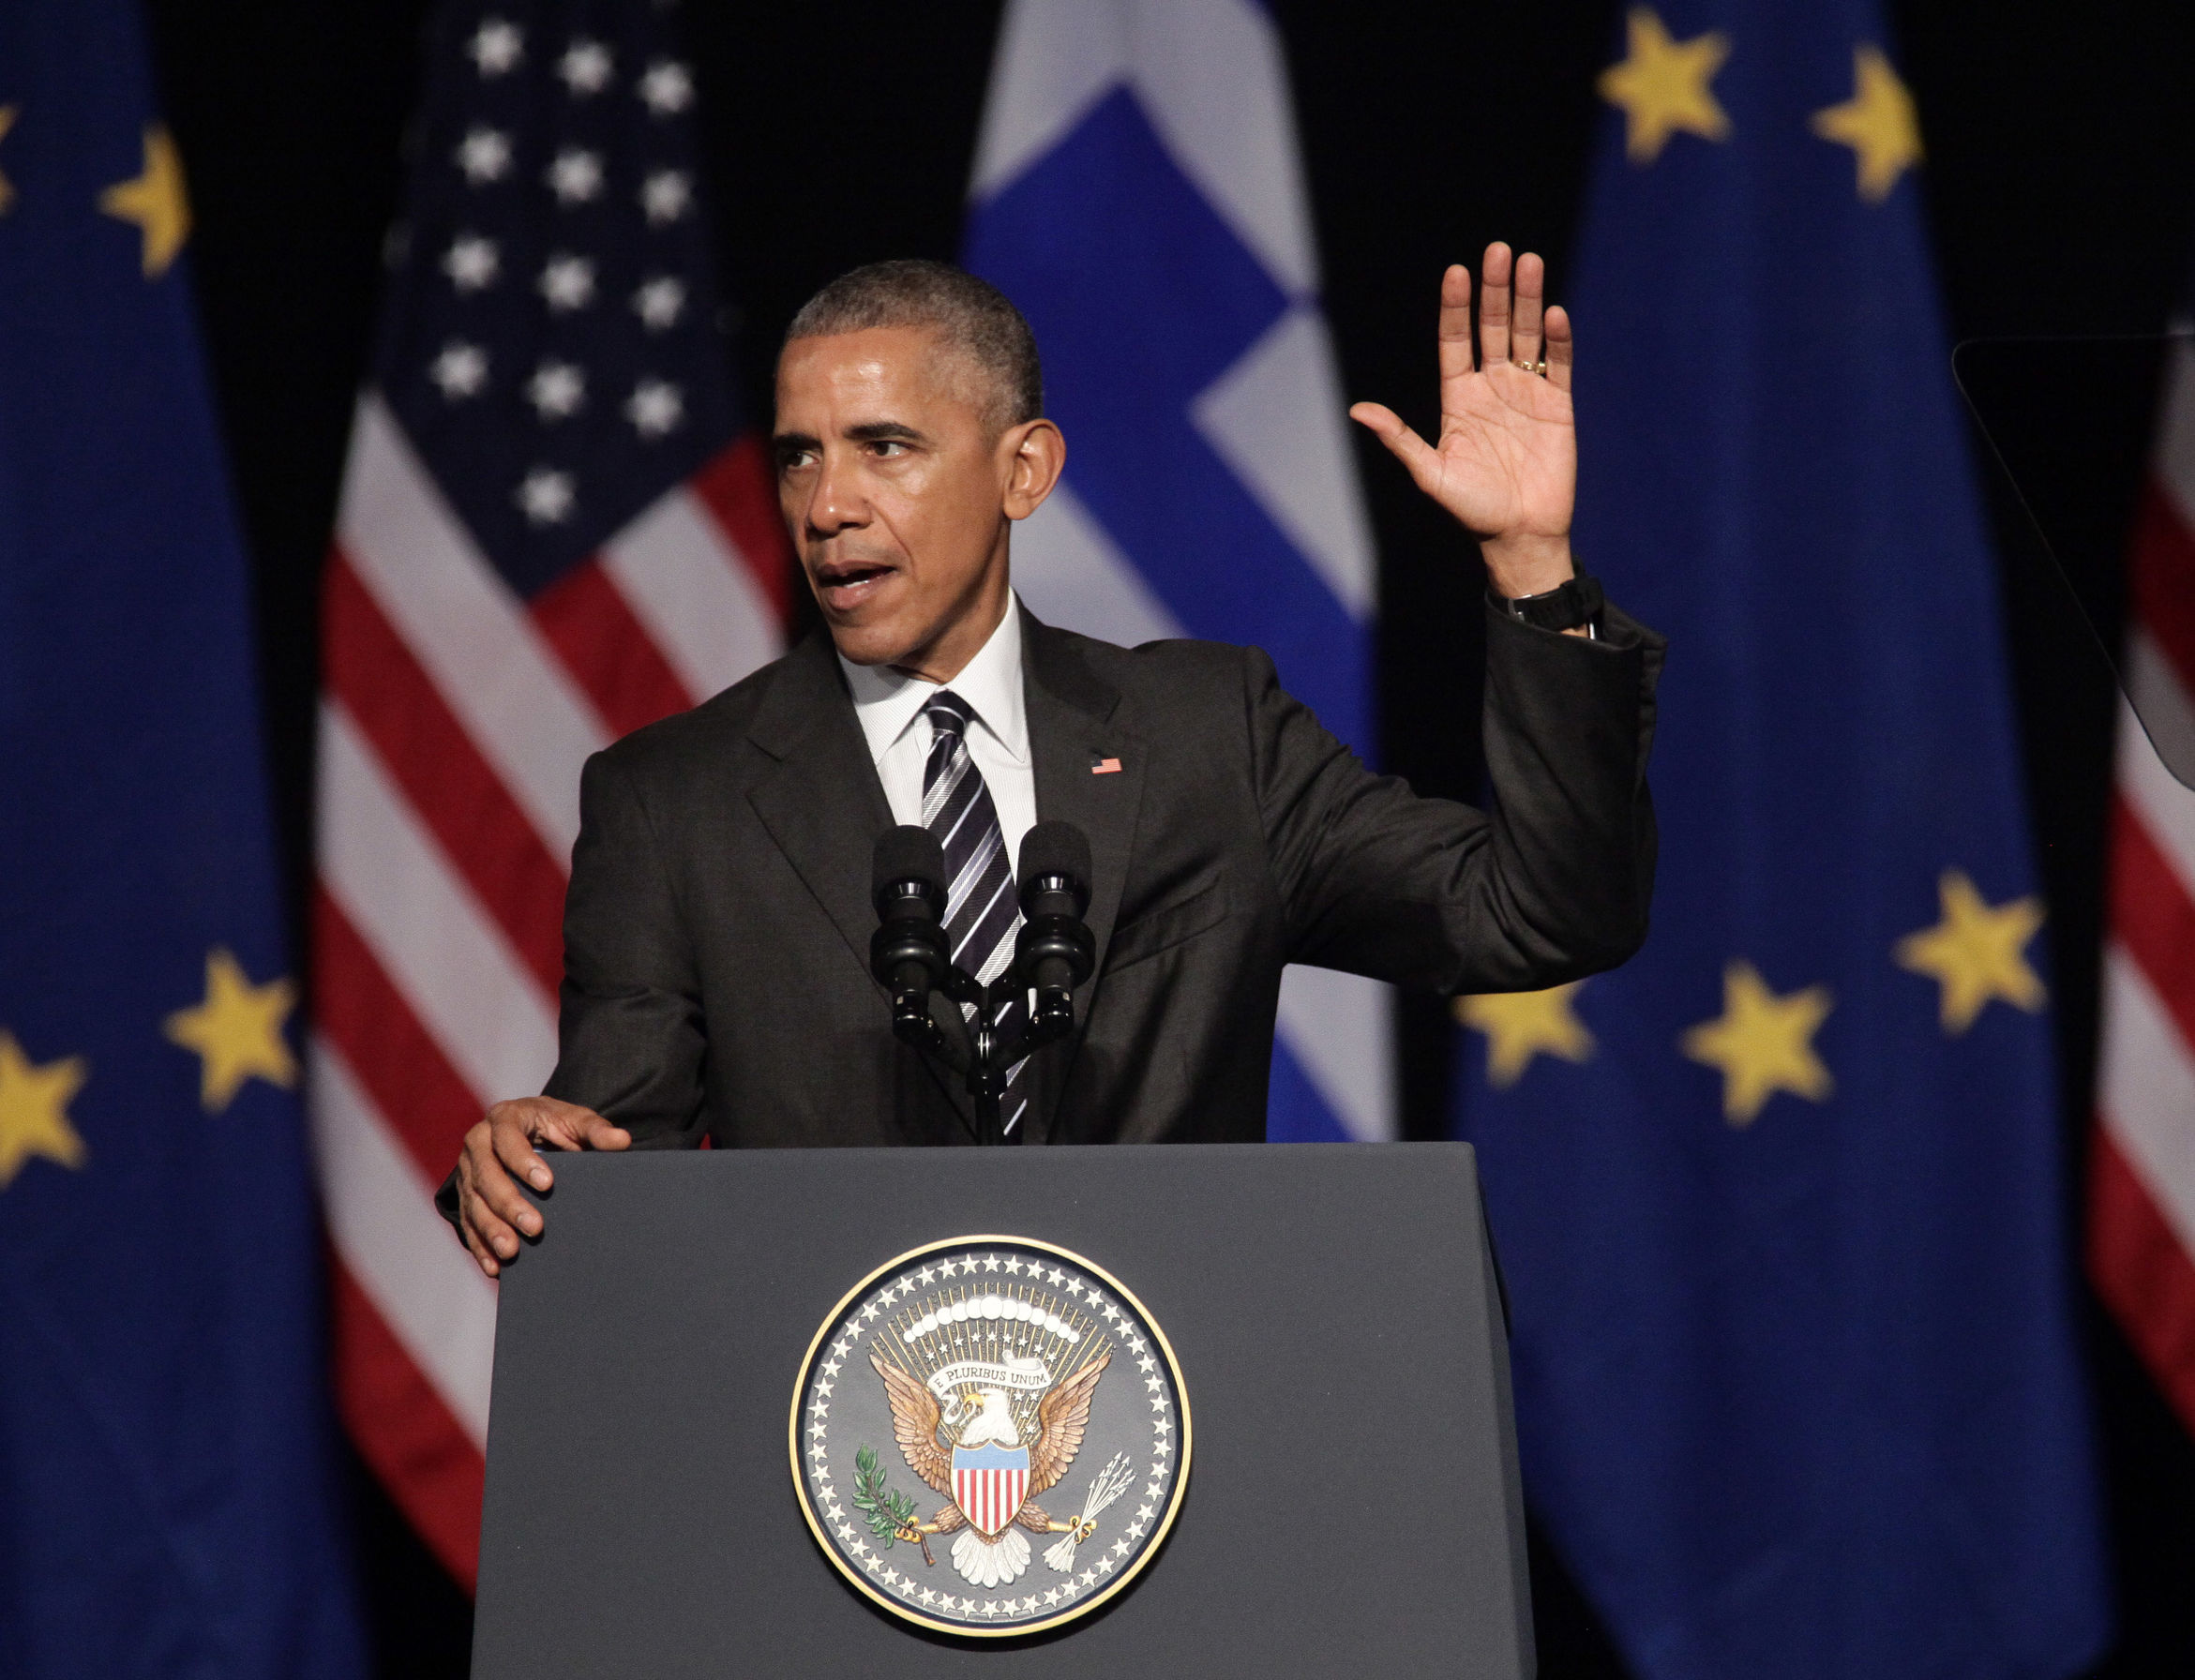 President Obama giving a speech